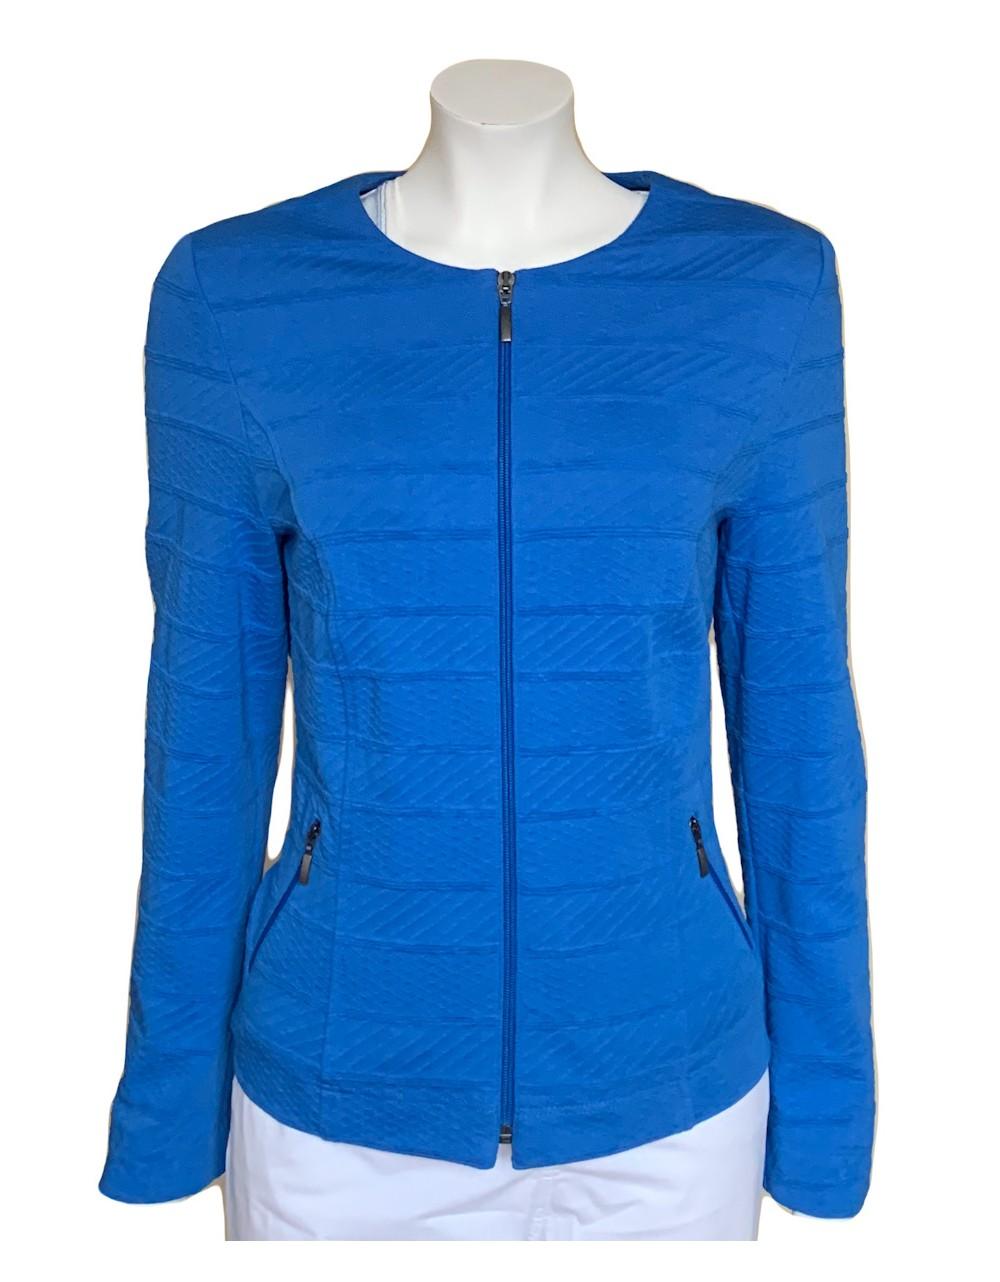 Barbara Lebek Summer Blazer|Lebek Clothing|Irish Handcrafts 1